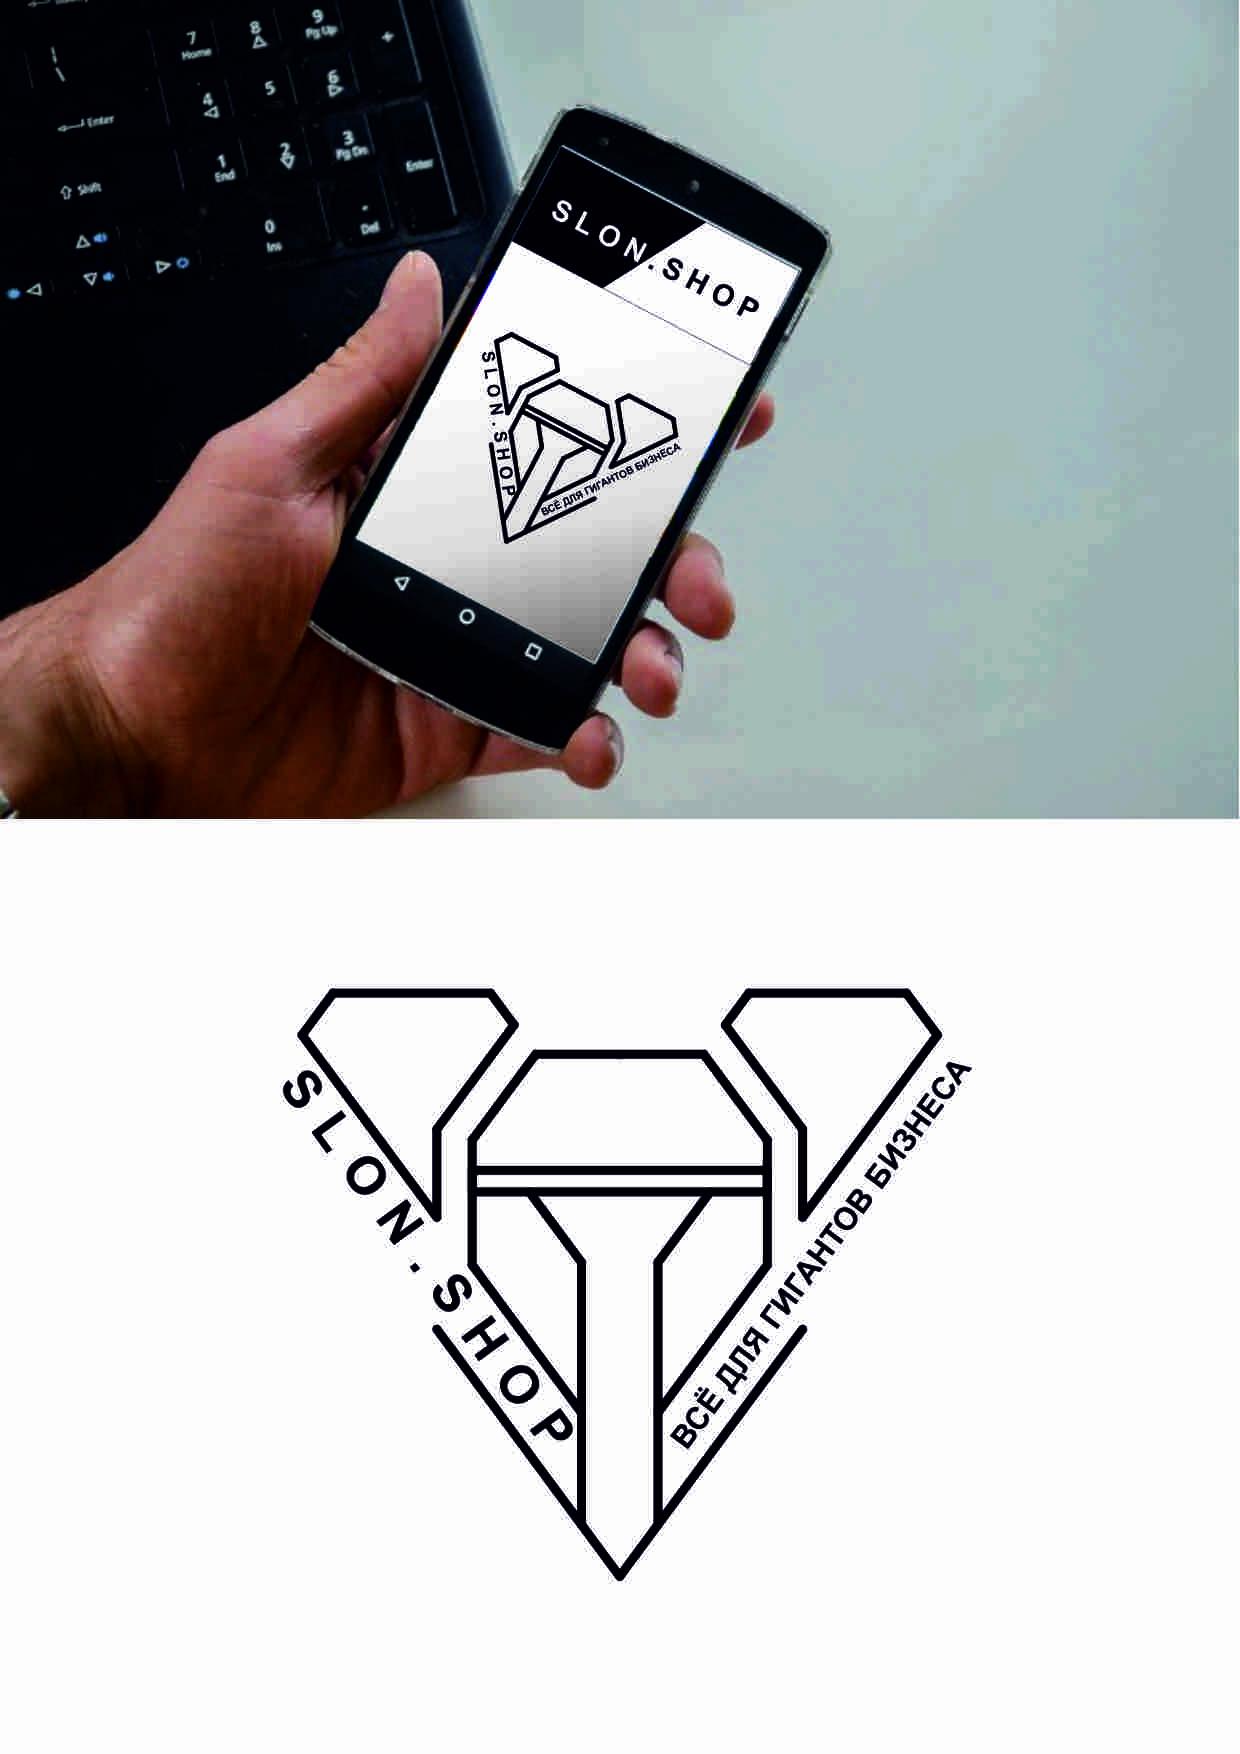 Разработать логотип и фирменный стиль интернет-магазина  фото f_5505991fe7be079a.jpg